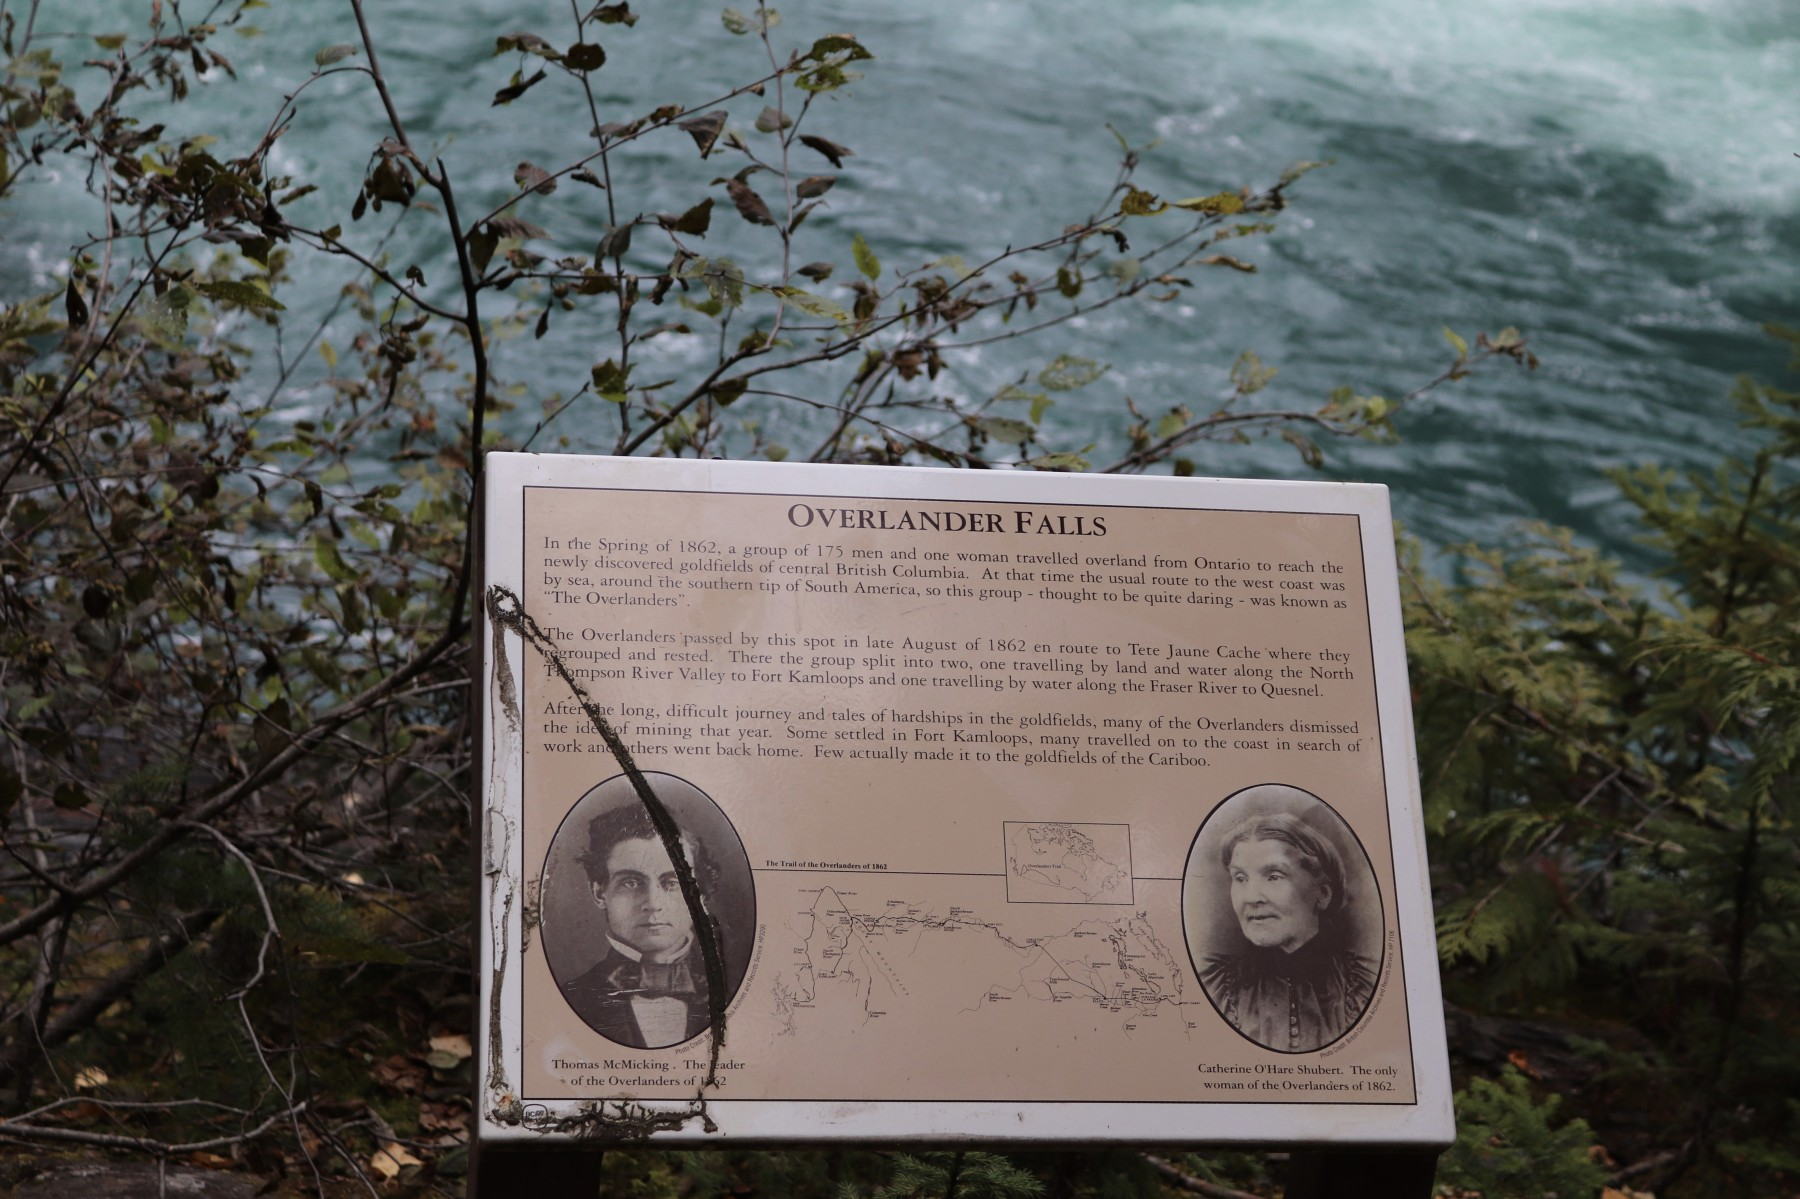 Overleander Falls